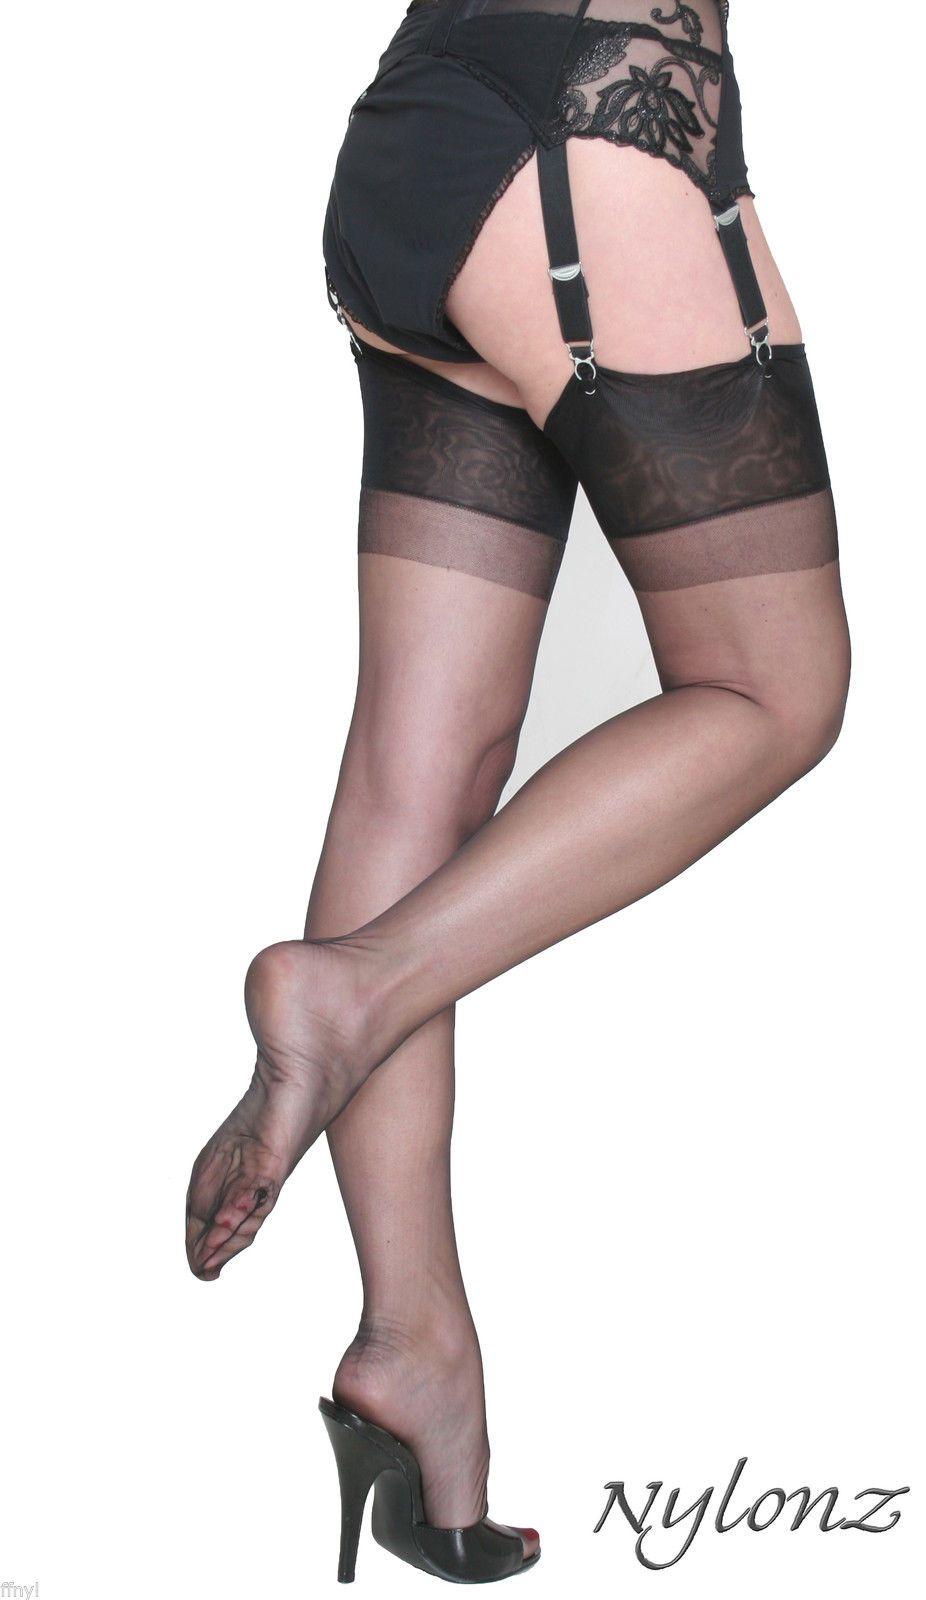 Rht stocking pics